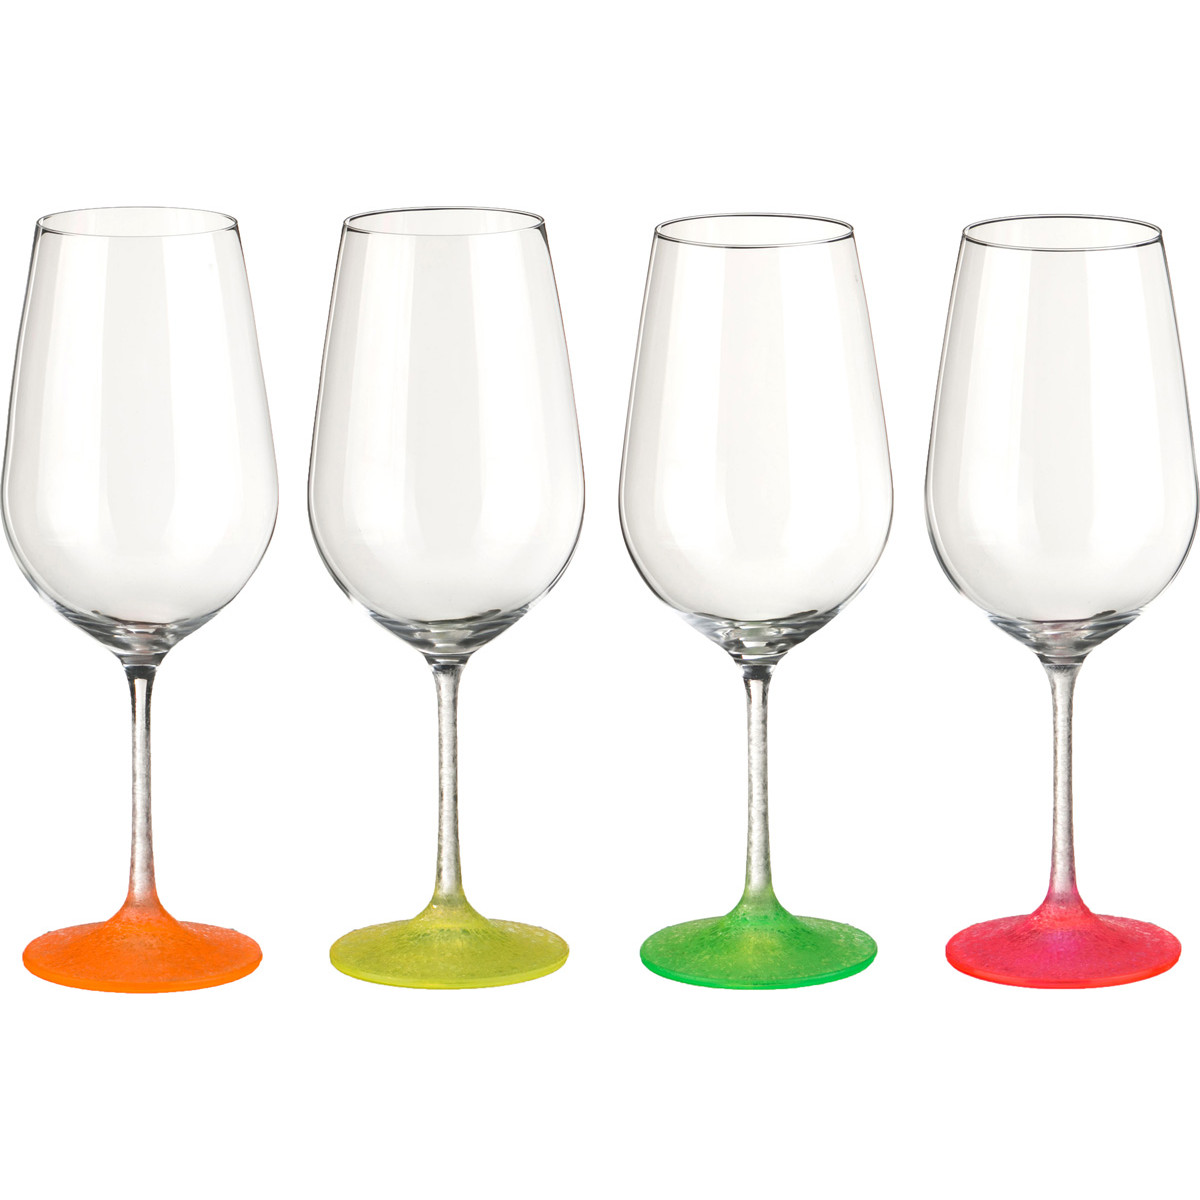 {} Bohemia Crystal Набор бокалов для вина Angelina  (550 мл - 4 шт) набор для кофе crystal bohemia mokko 4 предмета